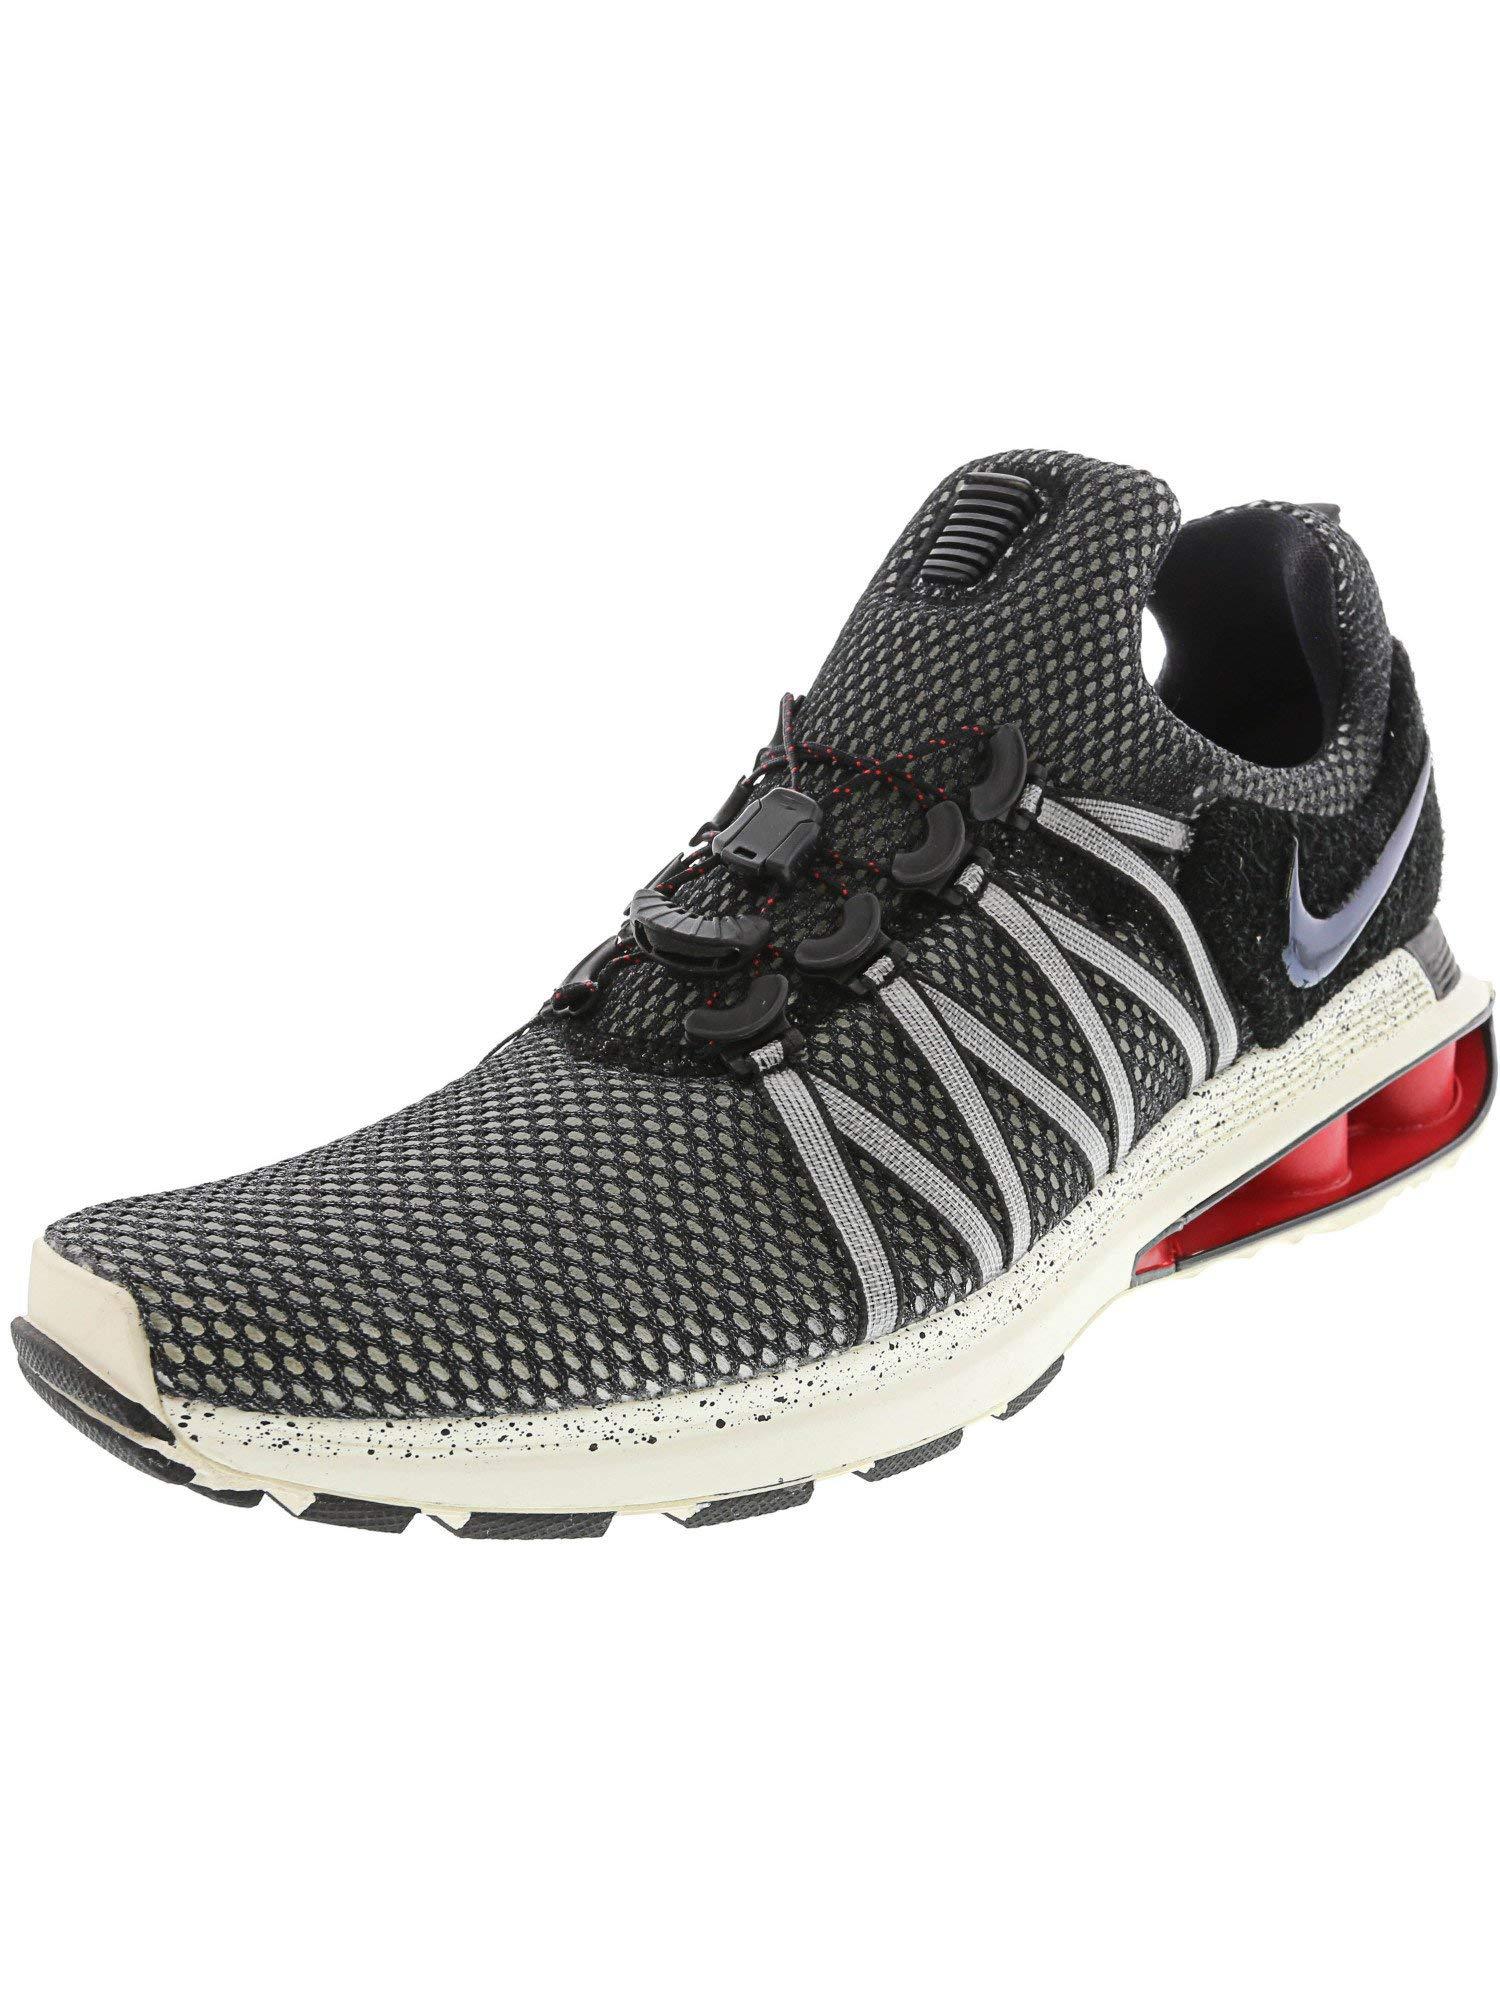 Nike Shox Gravity Mens Running Shoes 8 M US